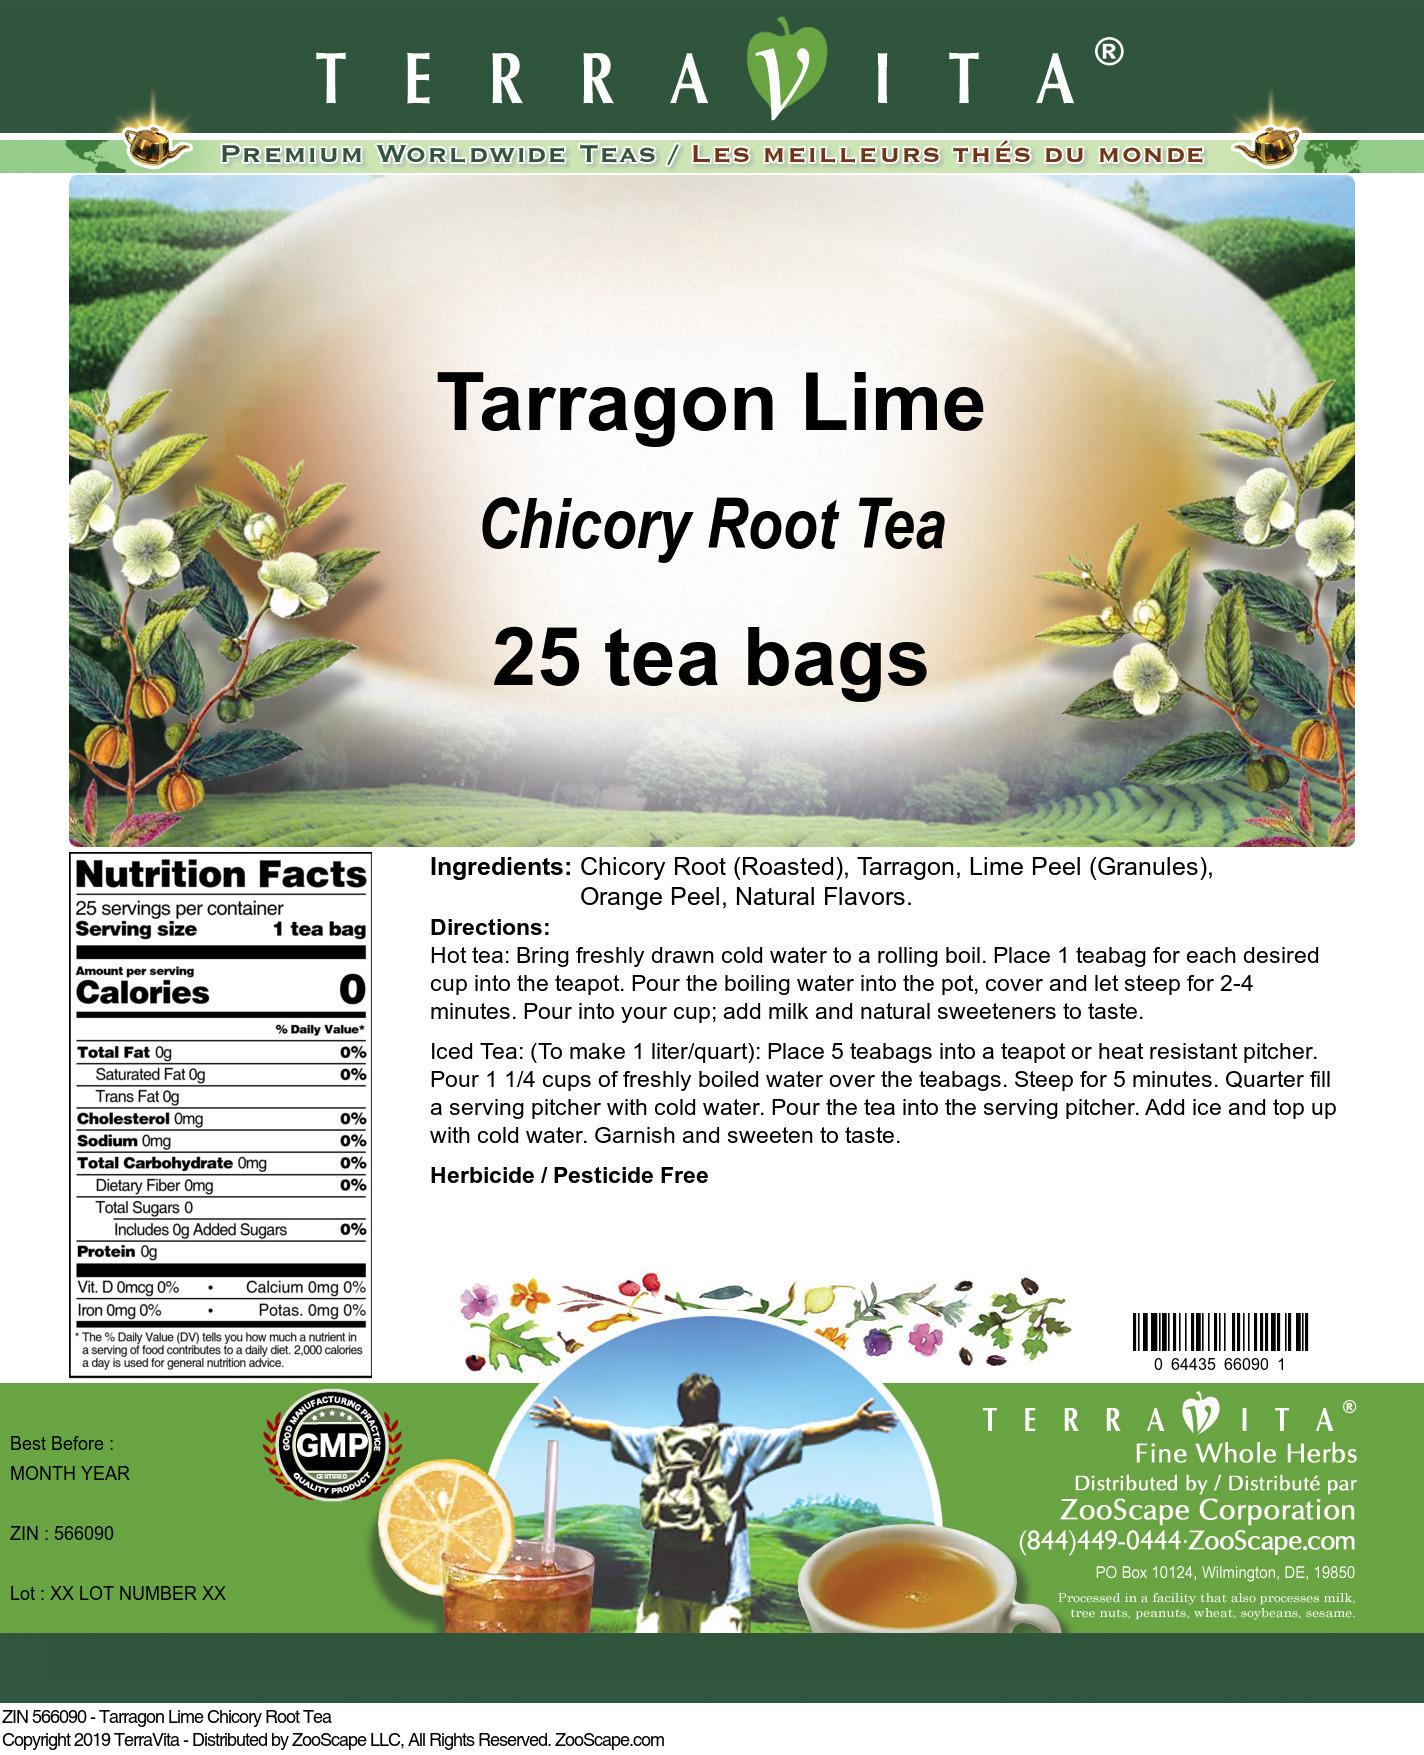 Tarragon Lime Chicory Root Tea